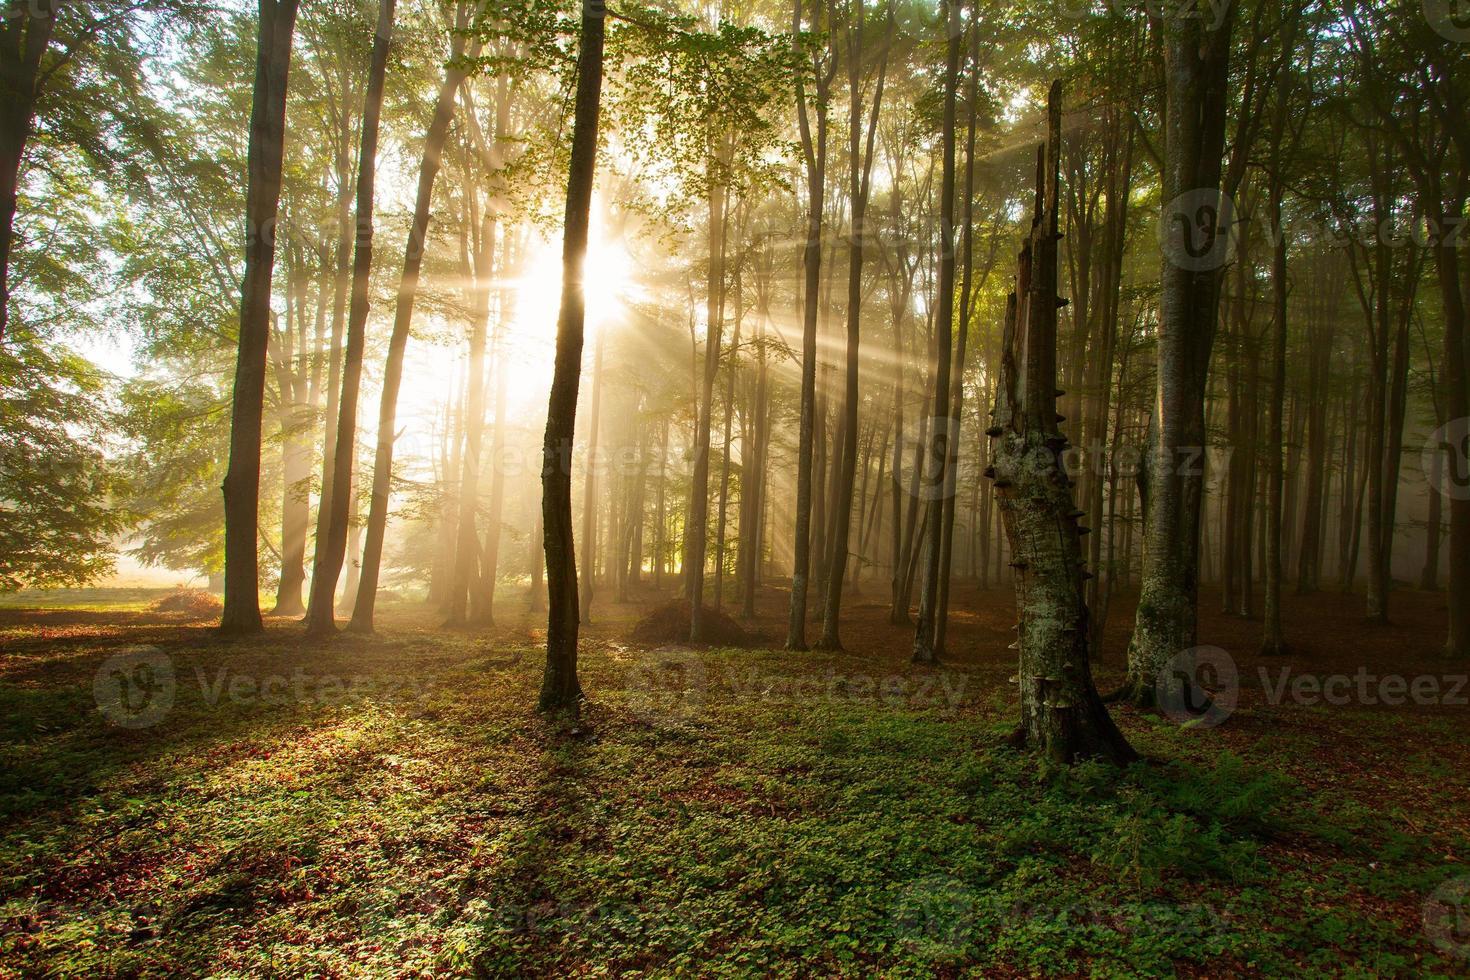 herfst bos bomen. natuur groen hout zonlicht achtergronden. foto